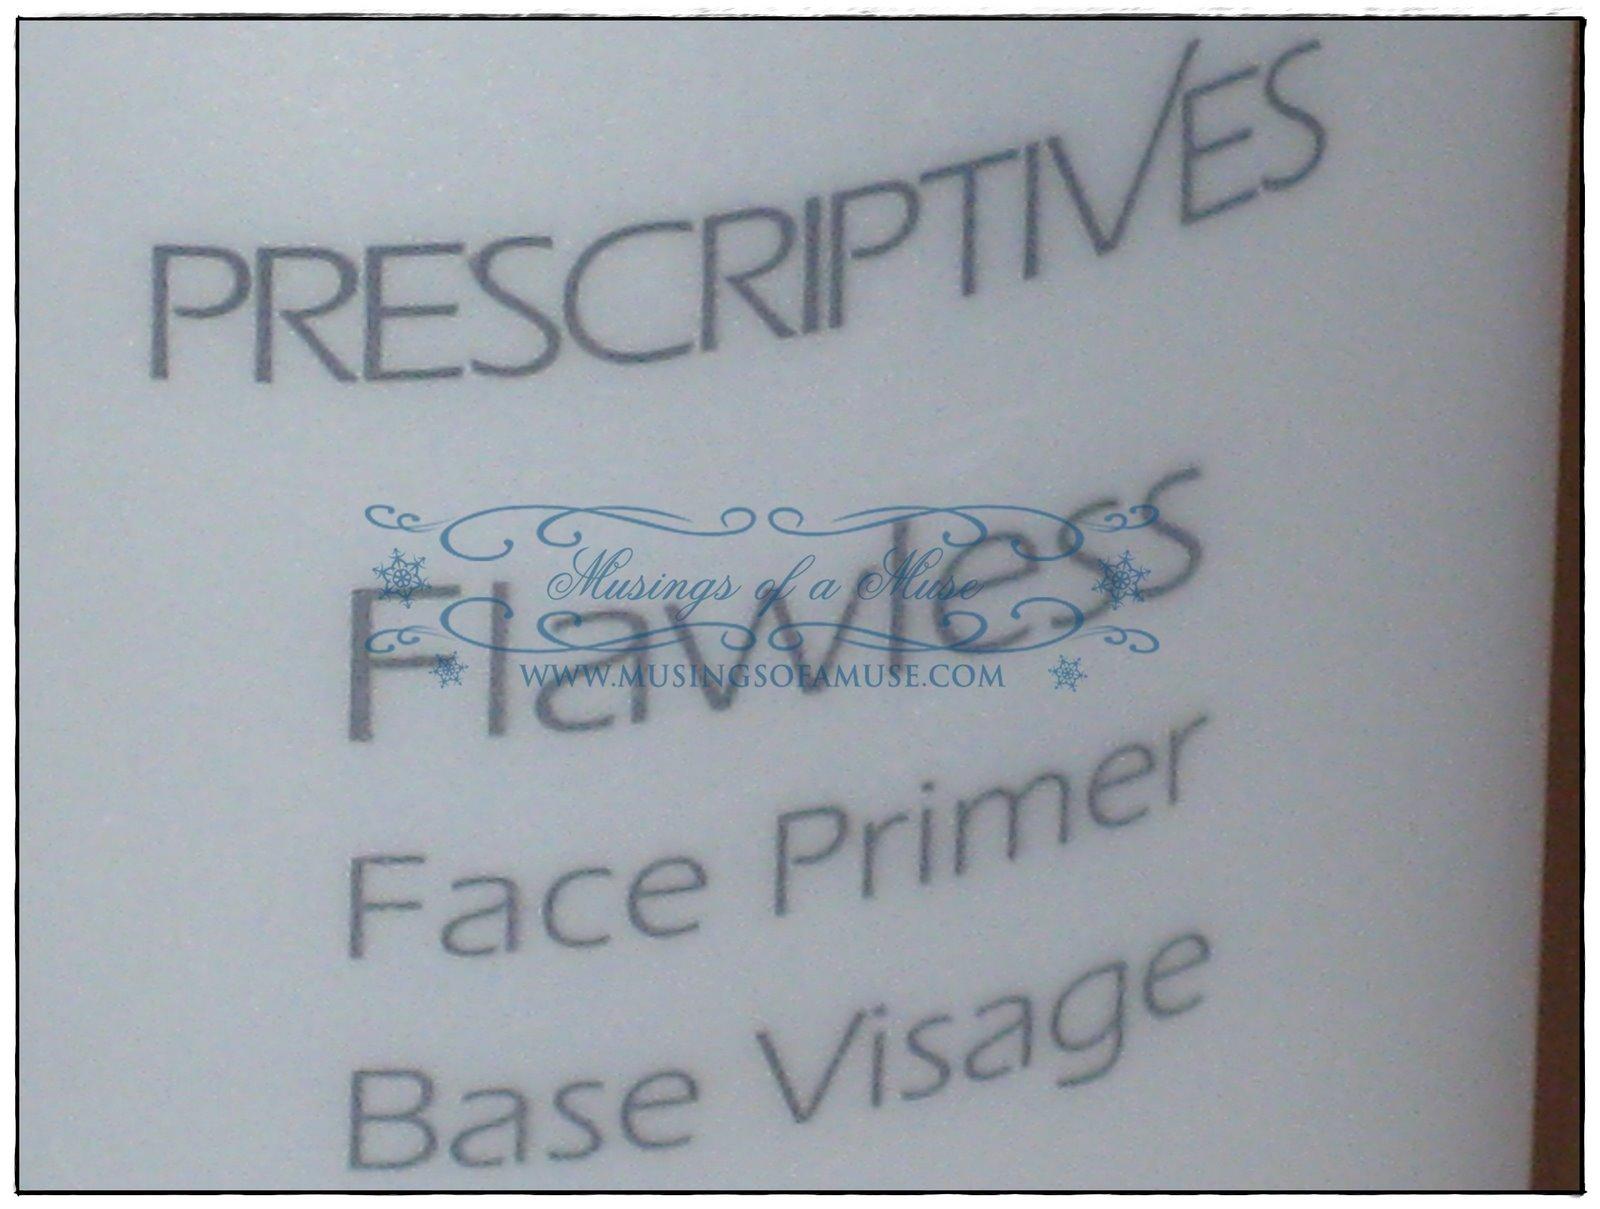 [Prescriptives+Flawless+Face+Primer+5.jpg]